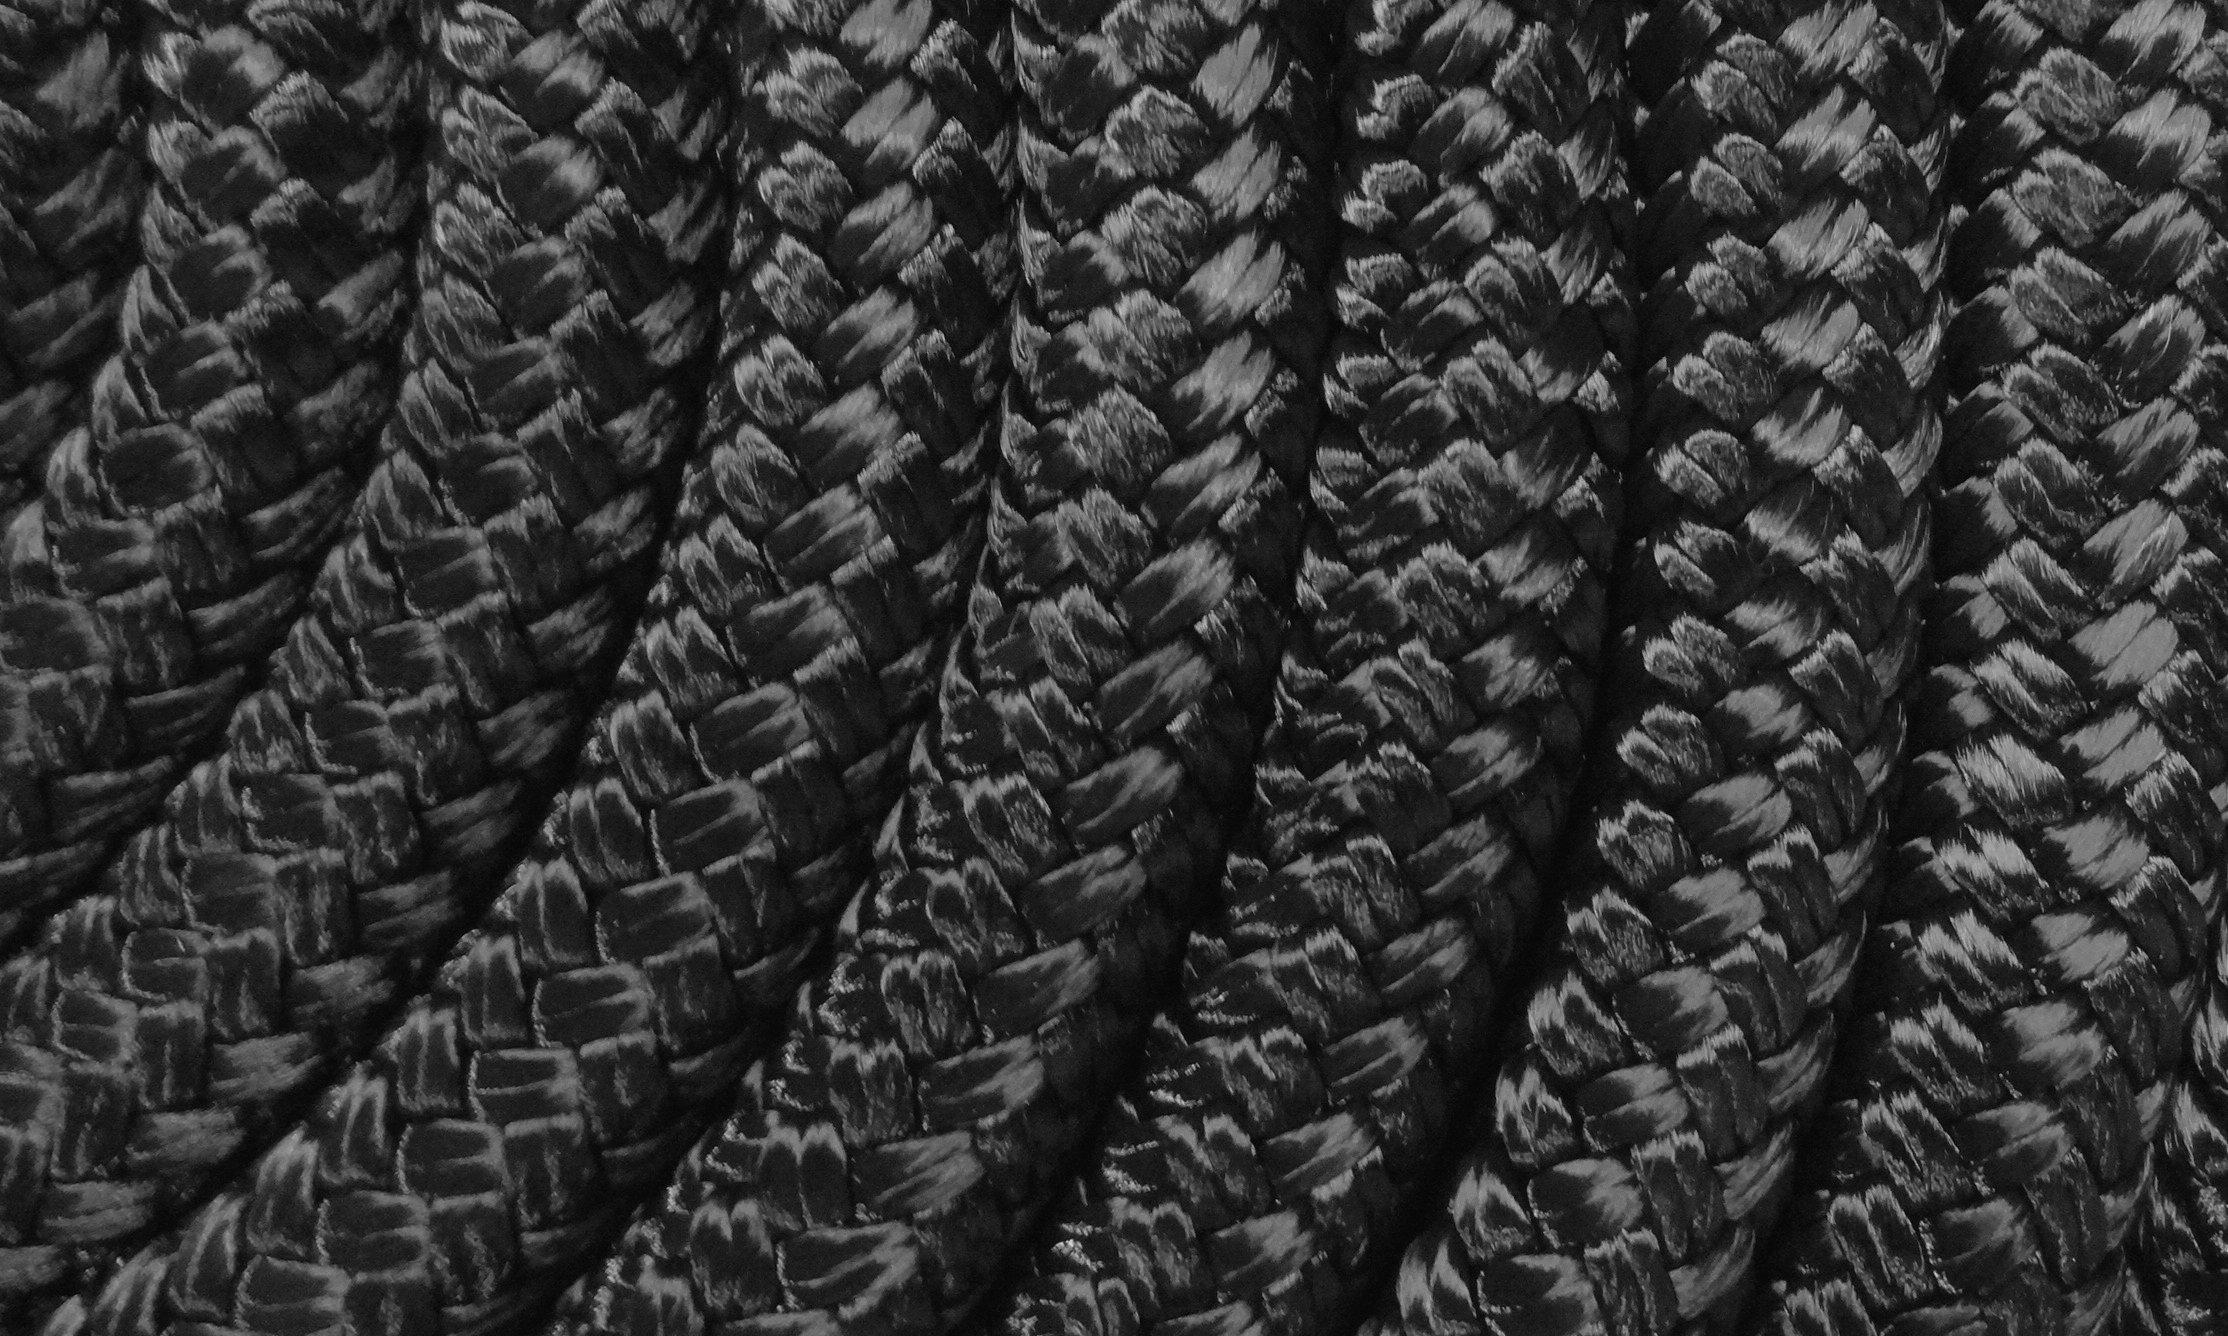 Miami Cordage NYB126C1 Nylon Double Braid 1/2 in x 600 ft Black